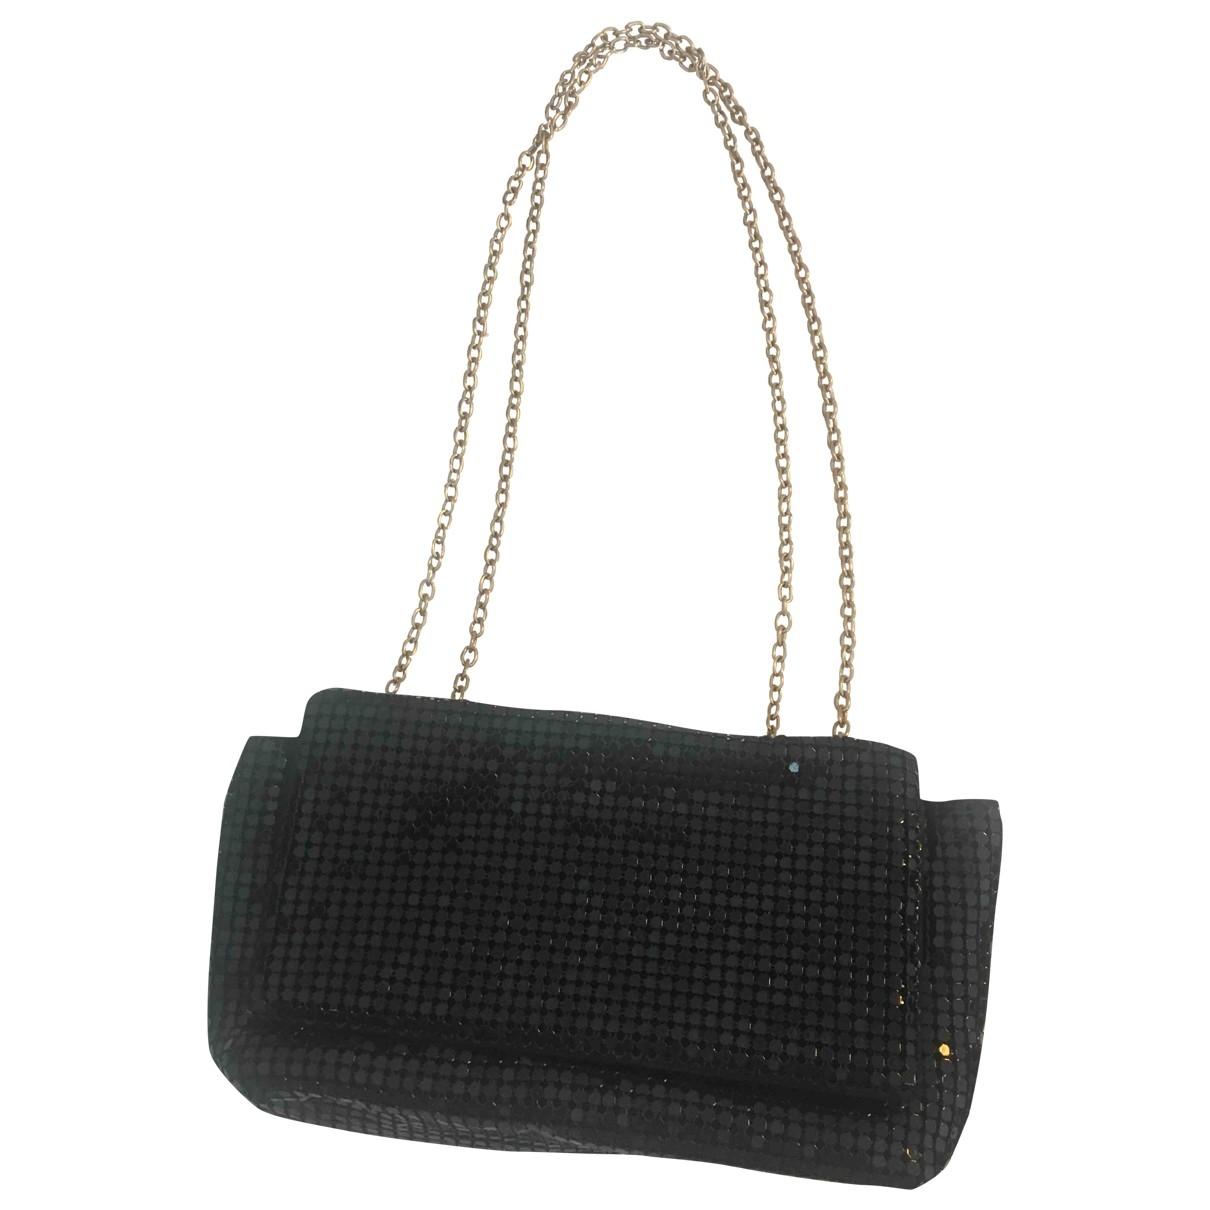 Bcbg Max Azria \N Black Clutch bag for Women \N